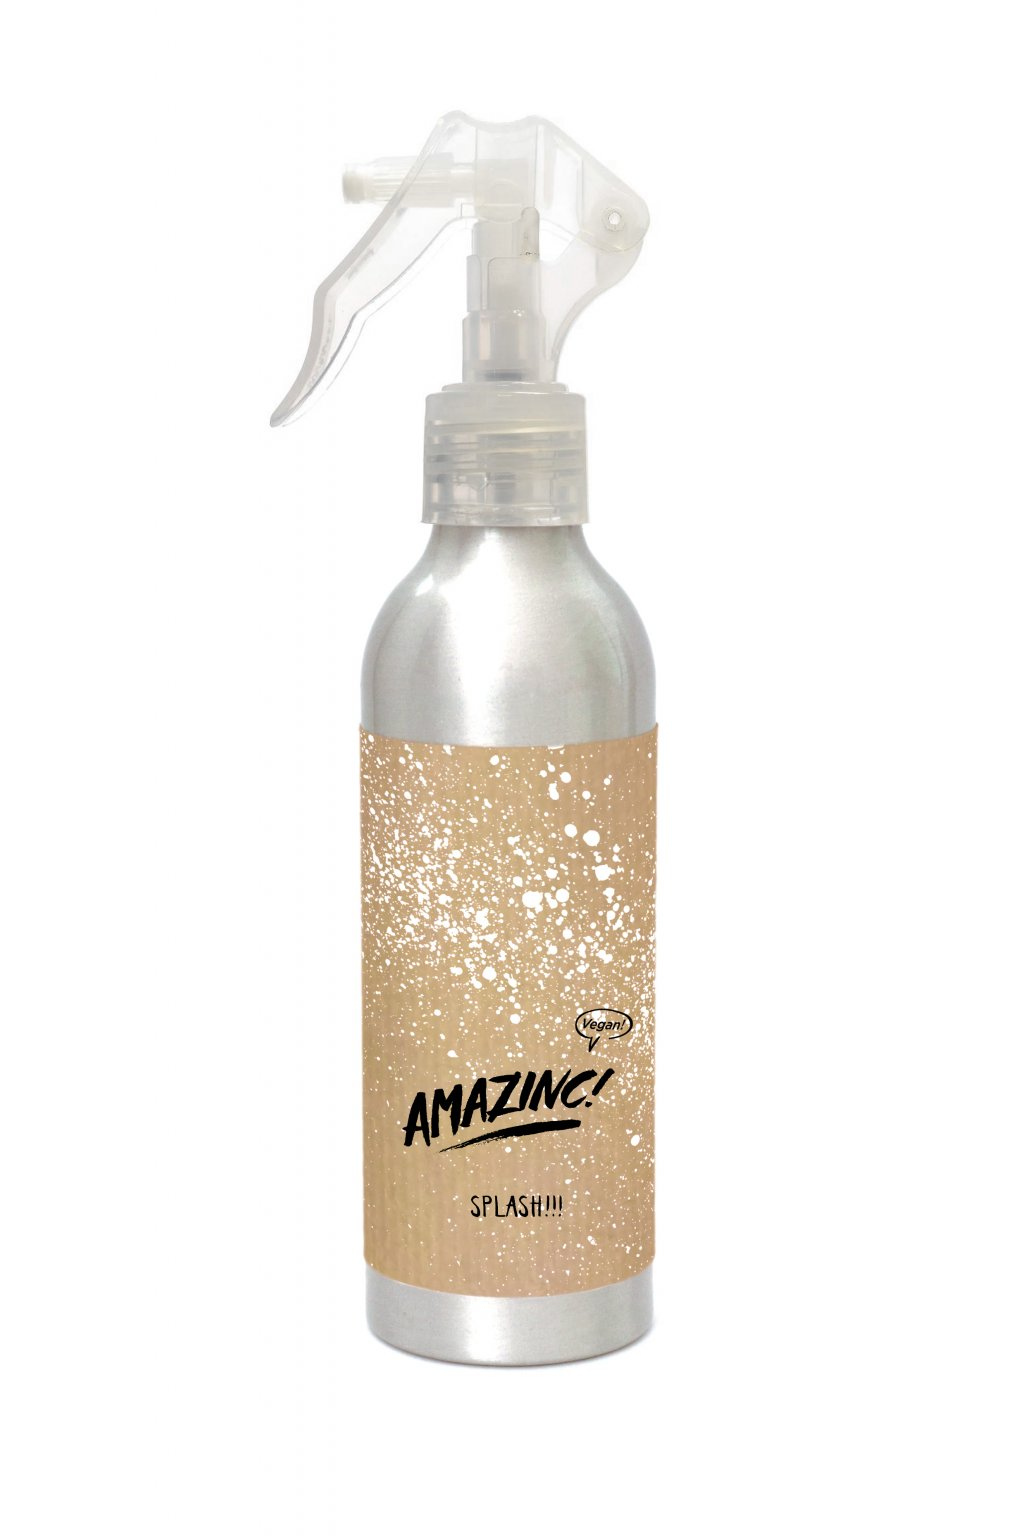 10 Splash Packaging Mockup Alu Bottle 150ml